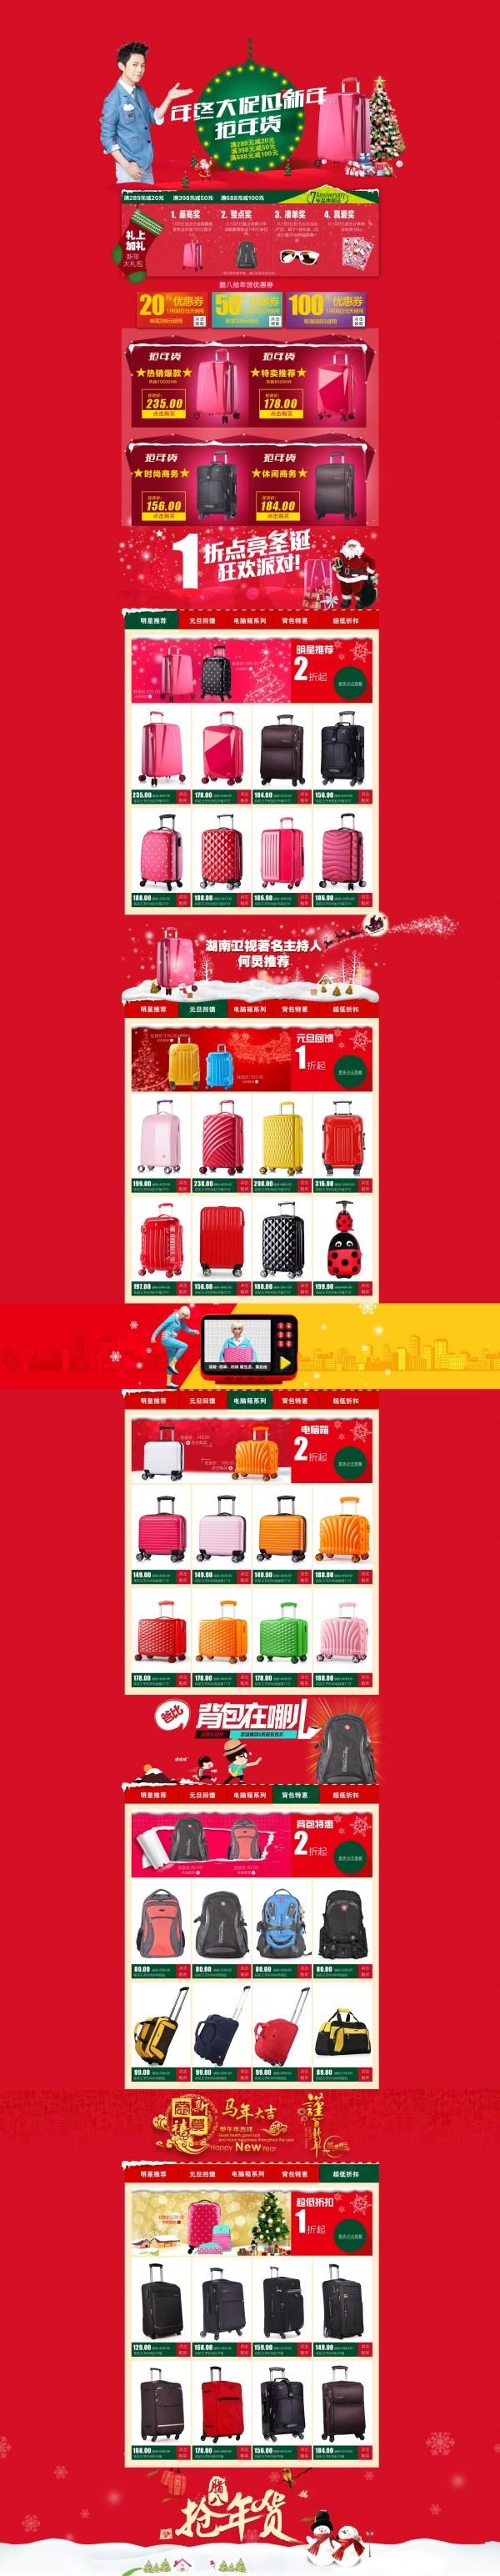 Taobao end of Web design PSD free